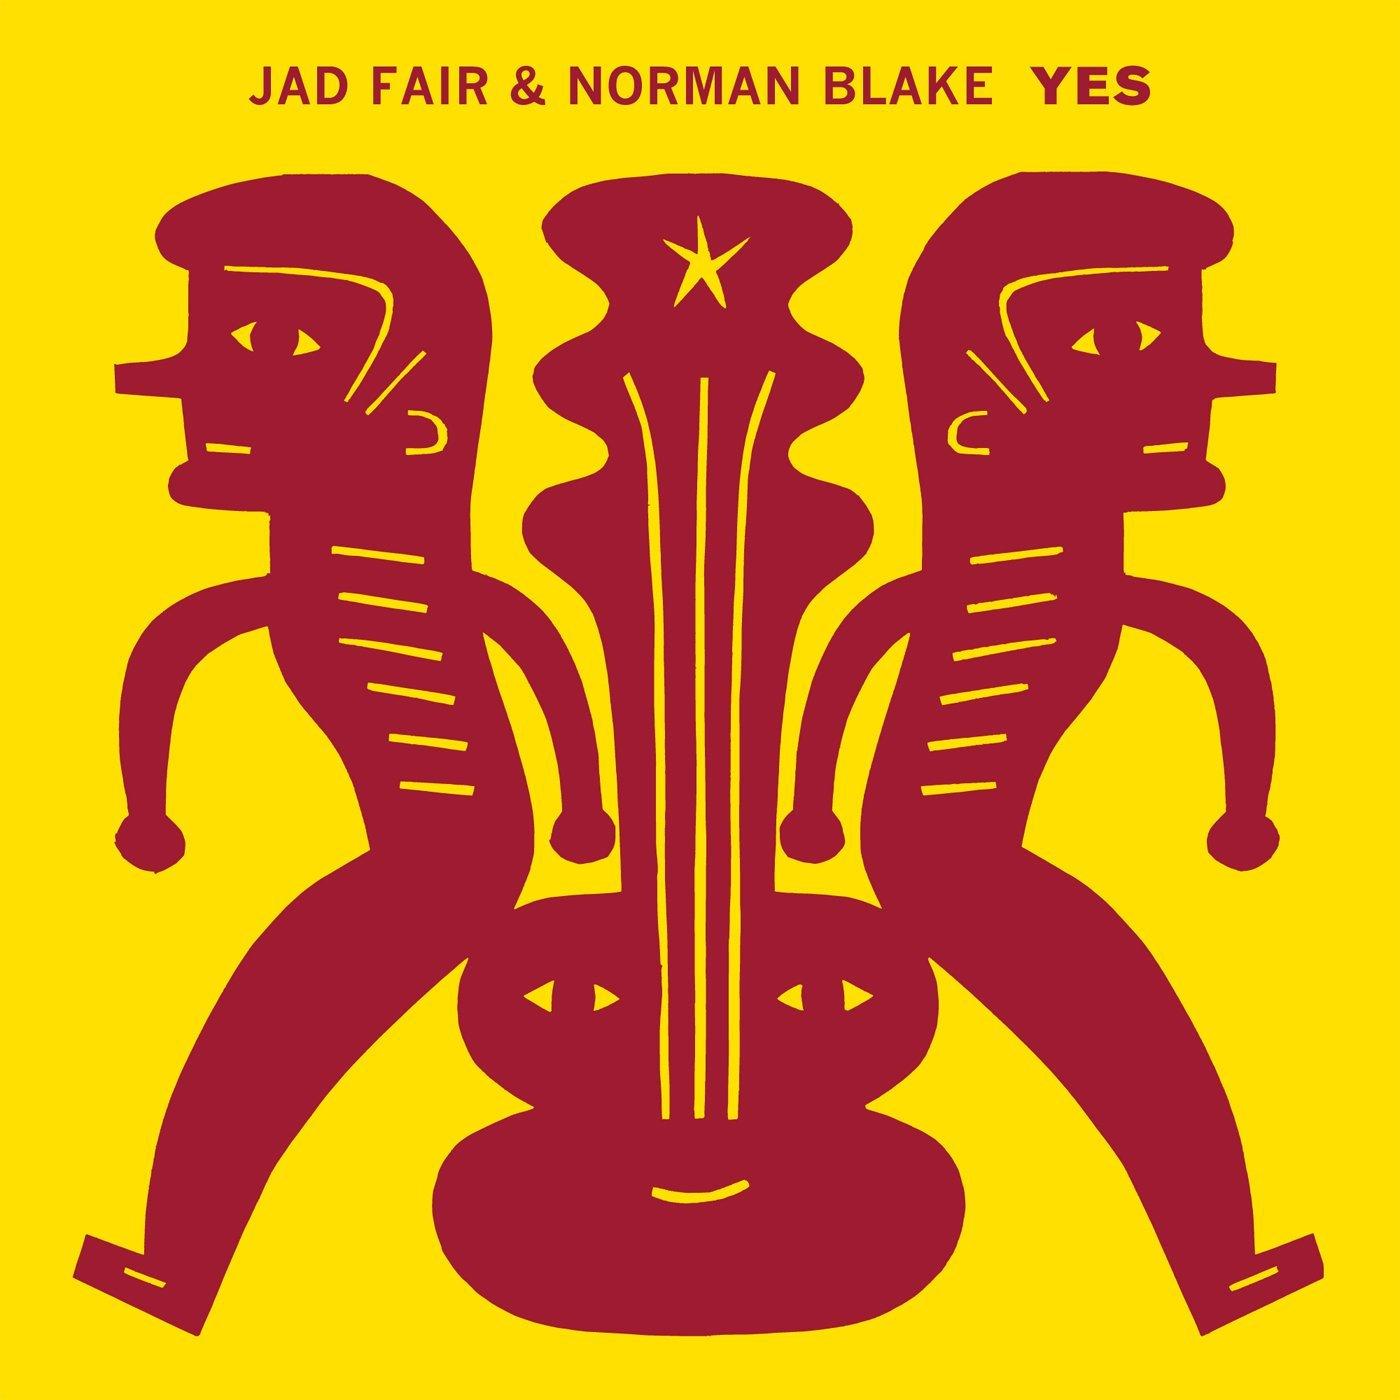 Jad Fair & Norman Blake - Yes